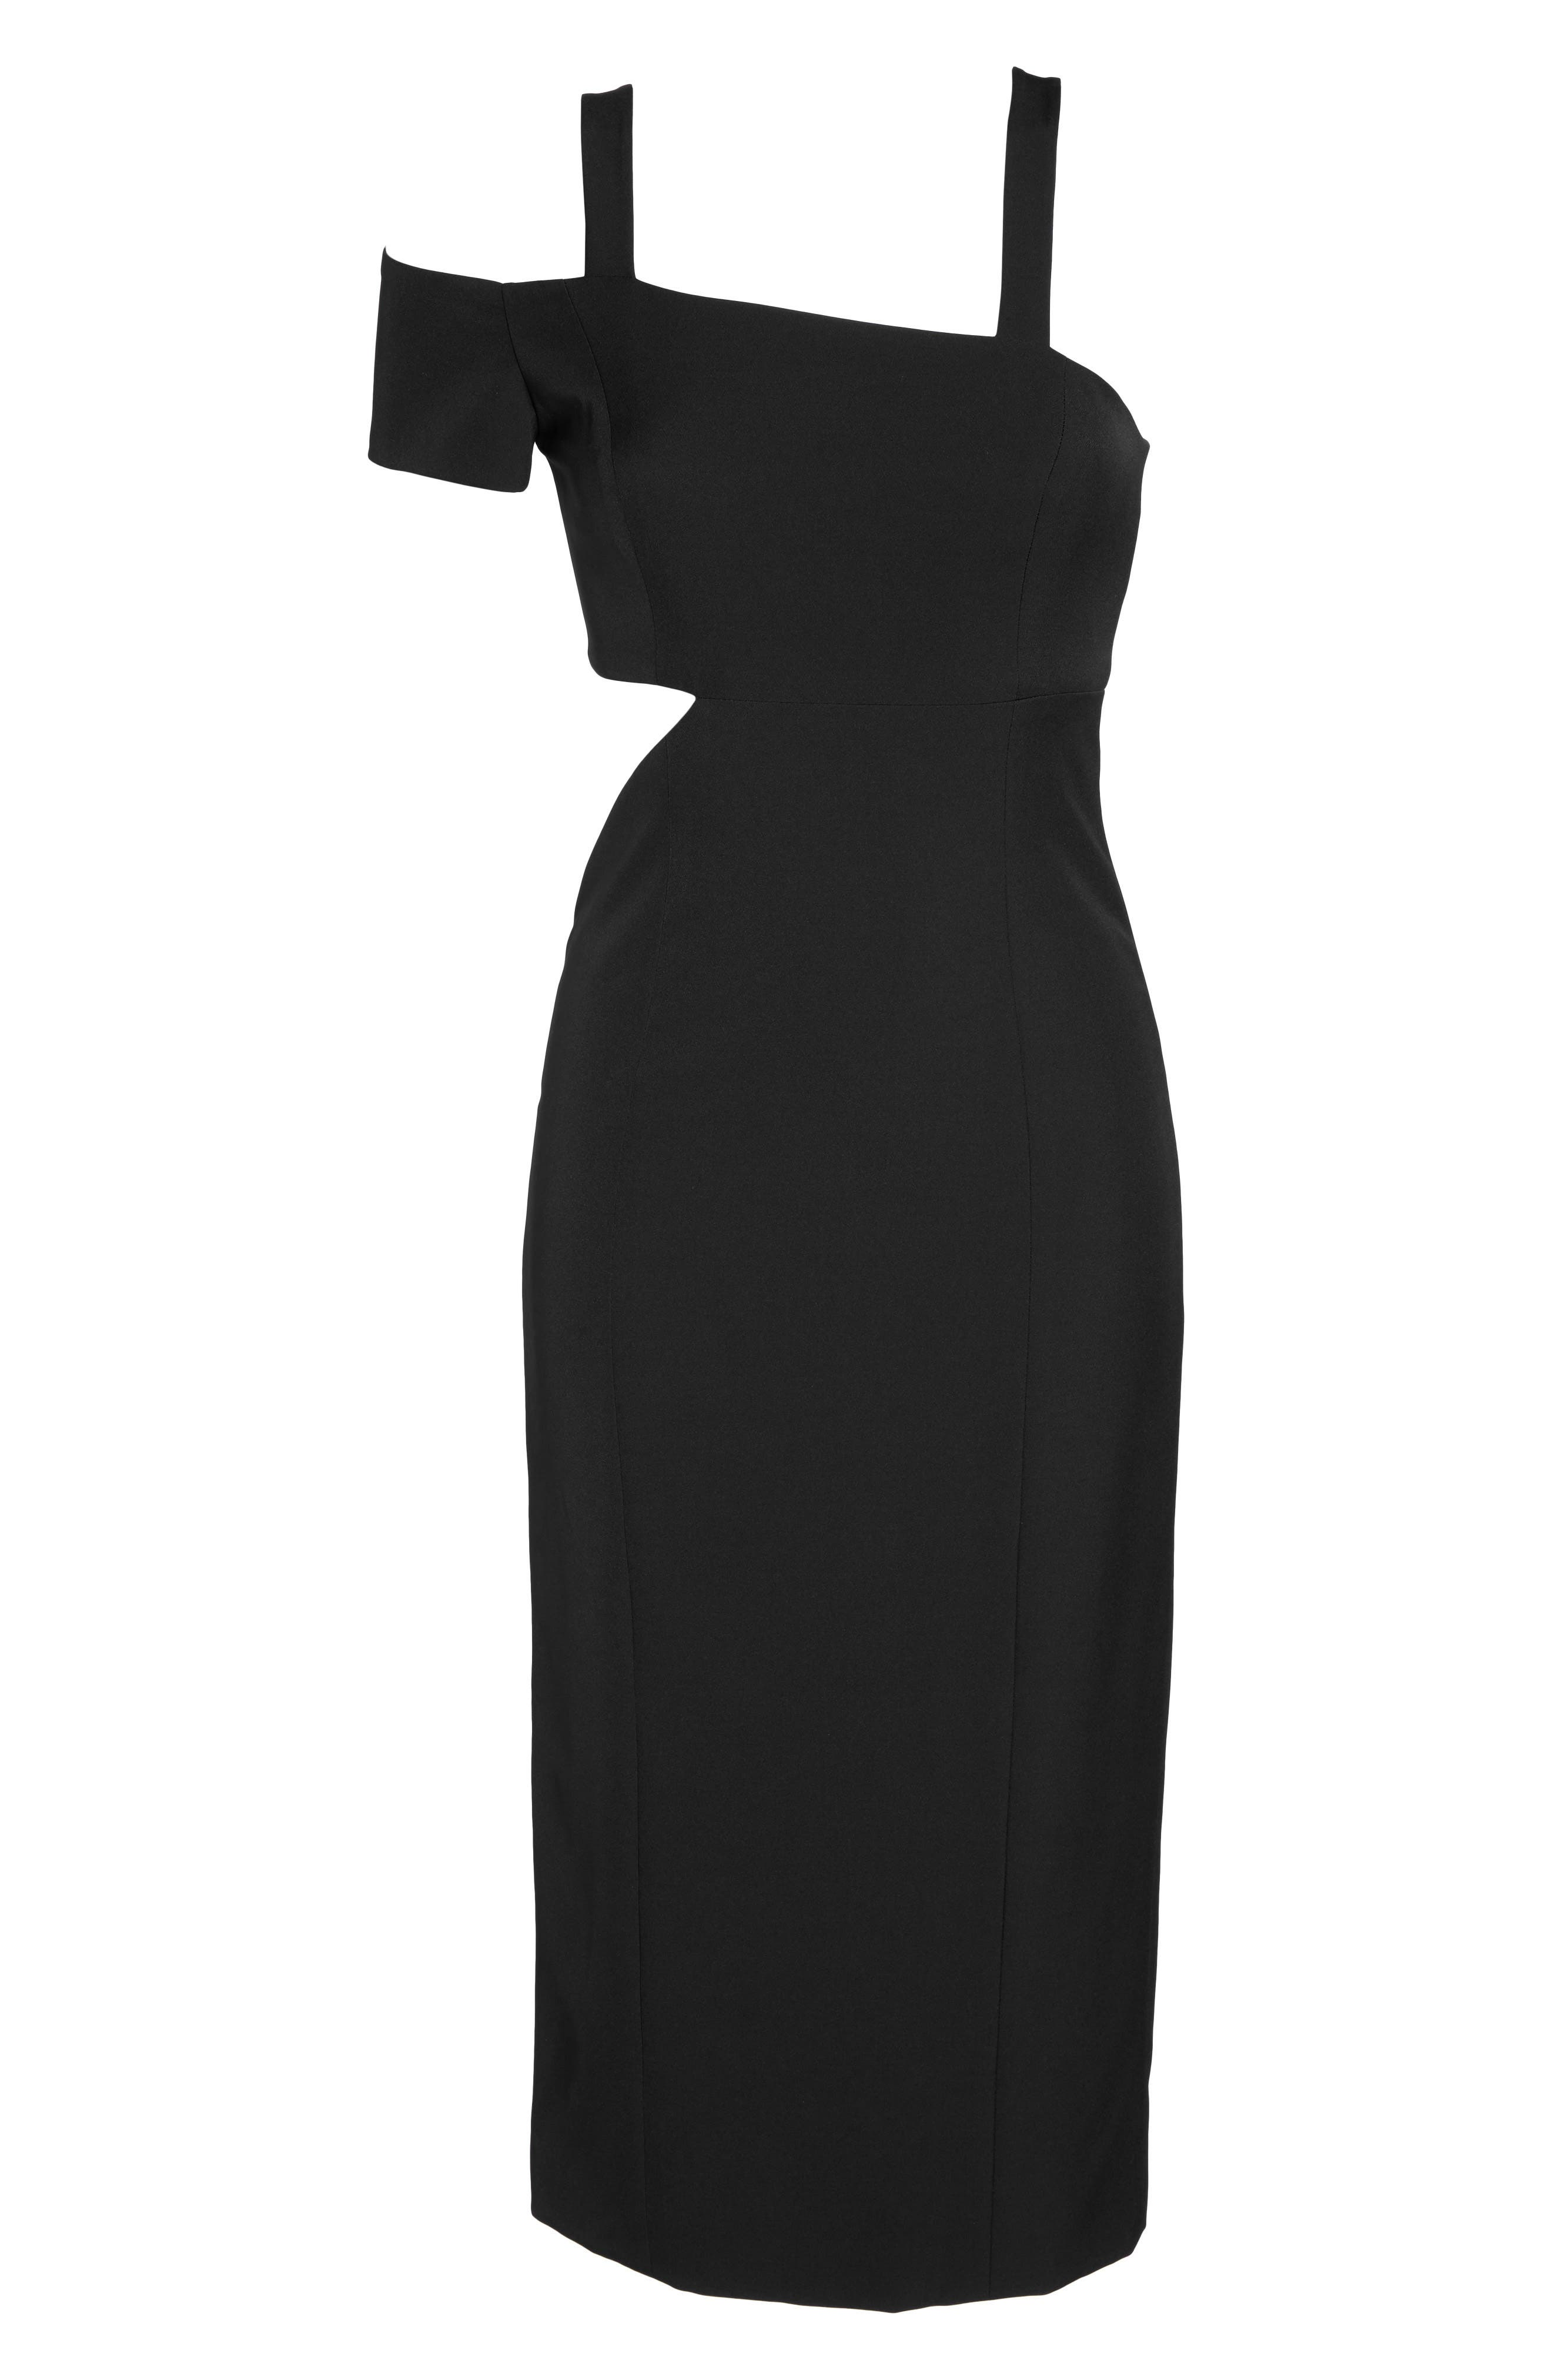 Marquette Cutout Sheath Dress,                             Alternate thumbnail 2, color,                             001